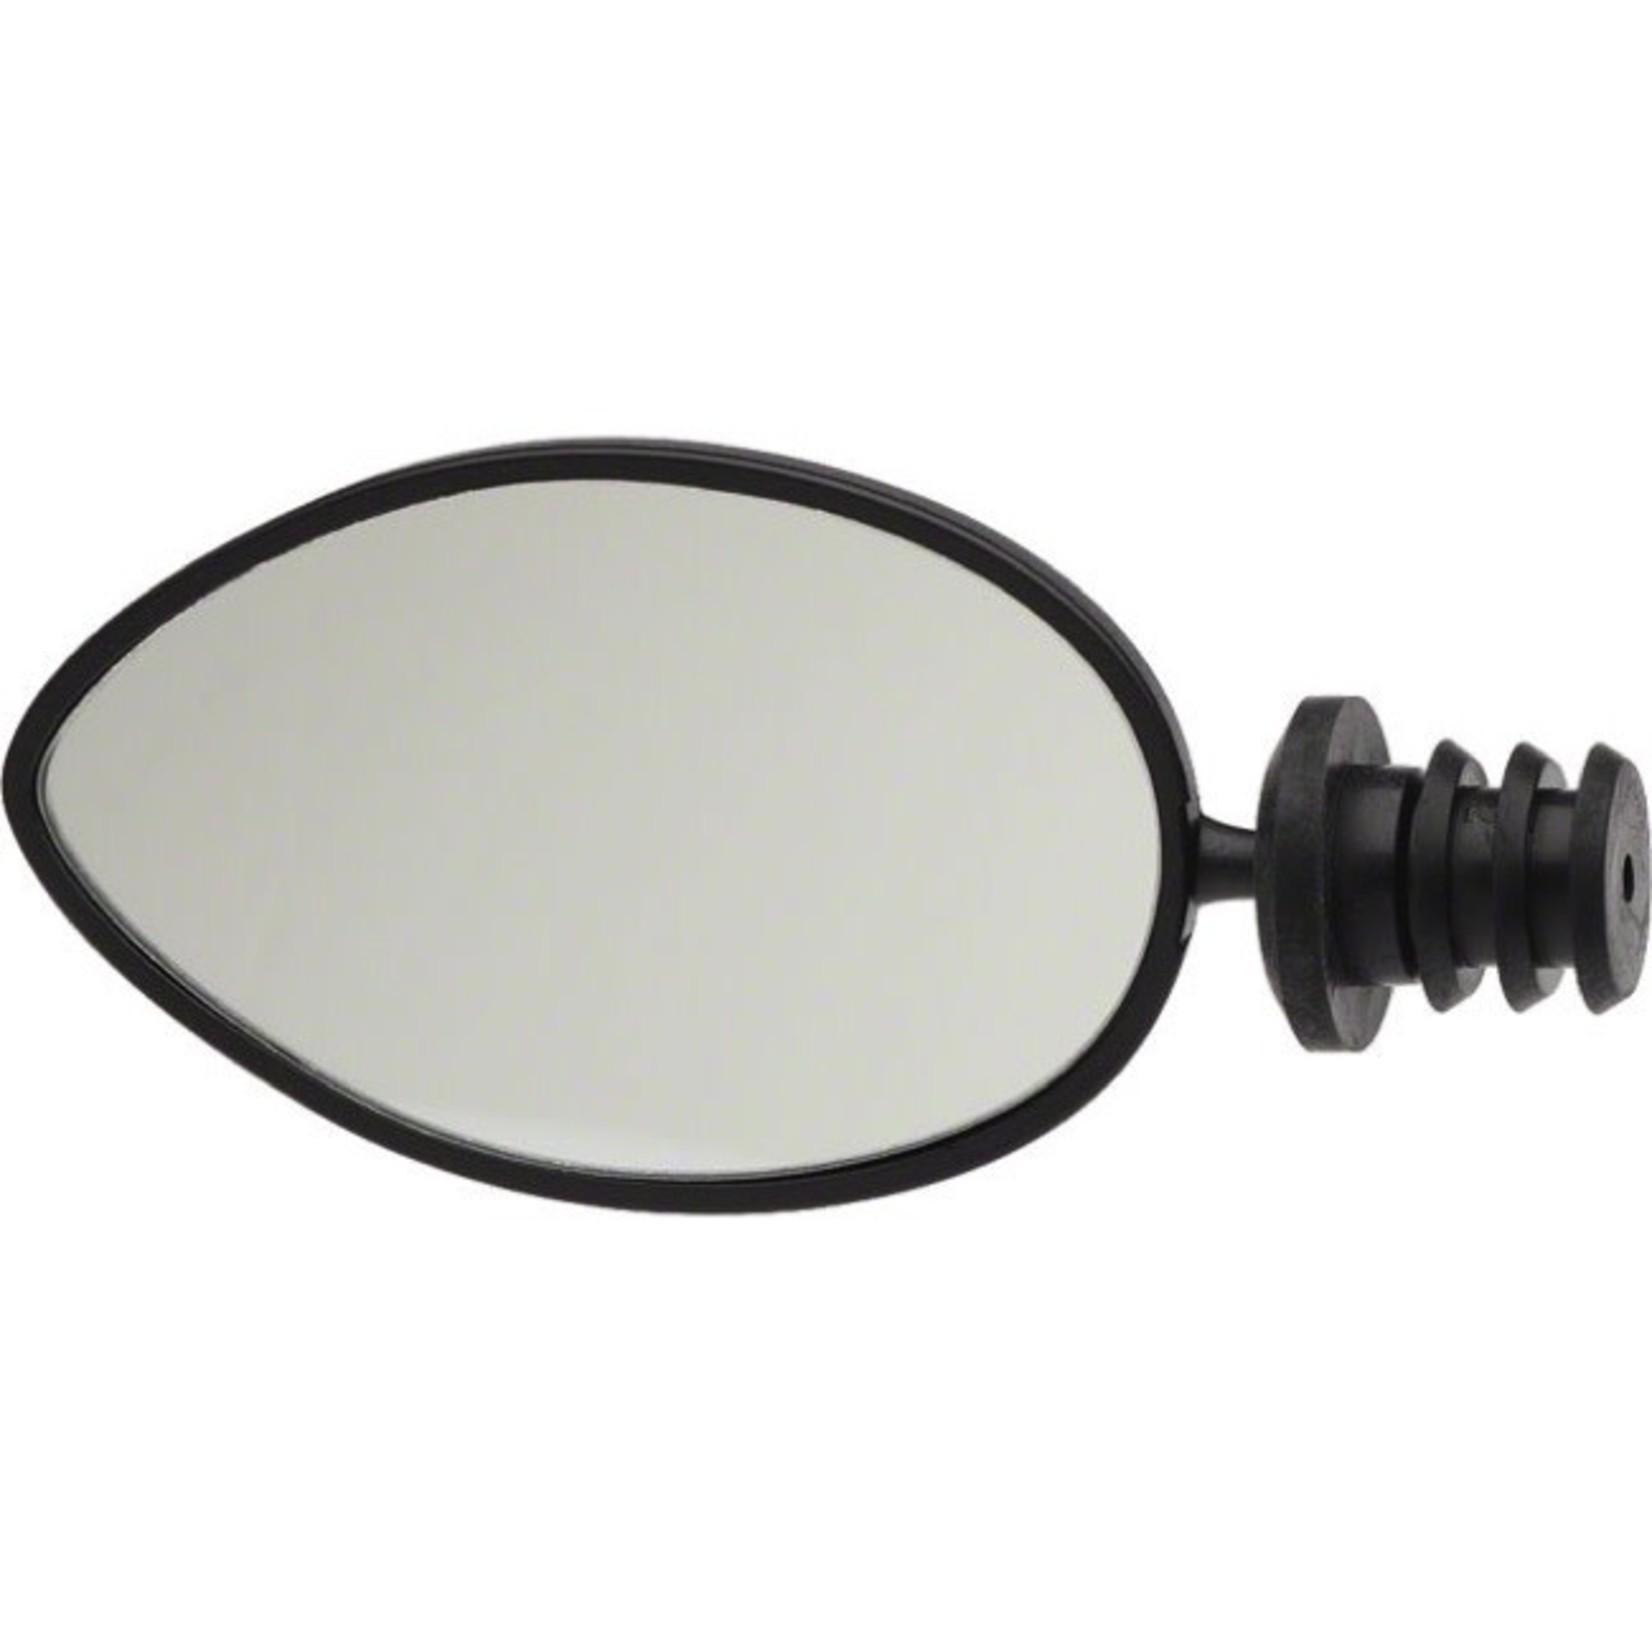 GEKKO Gekko Oval Bar End Mirror 45 x 70